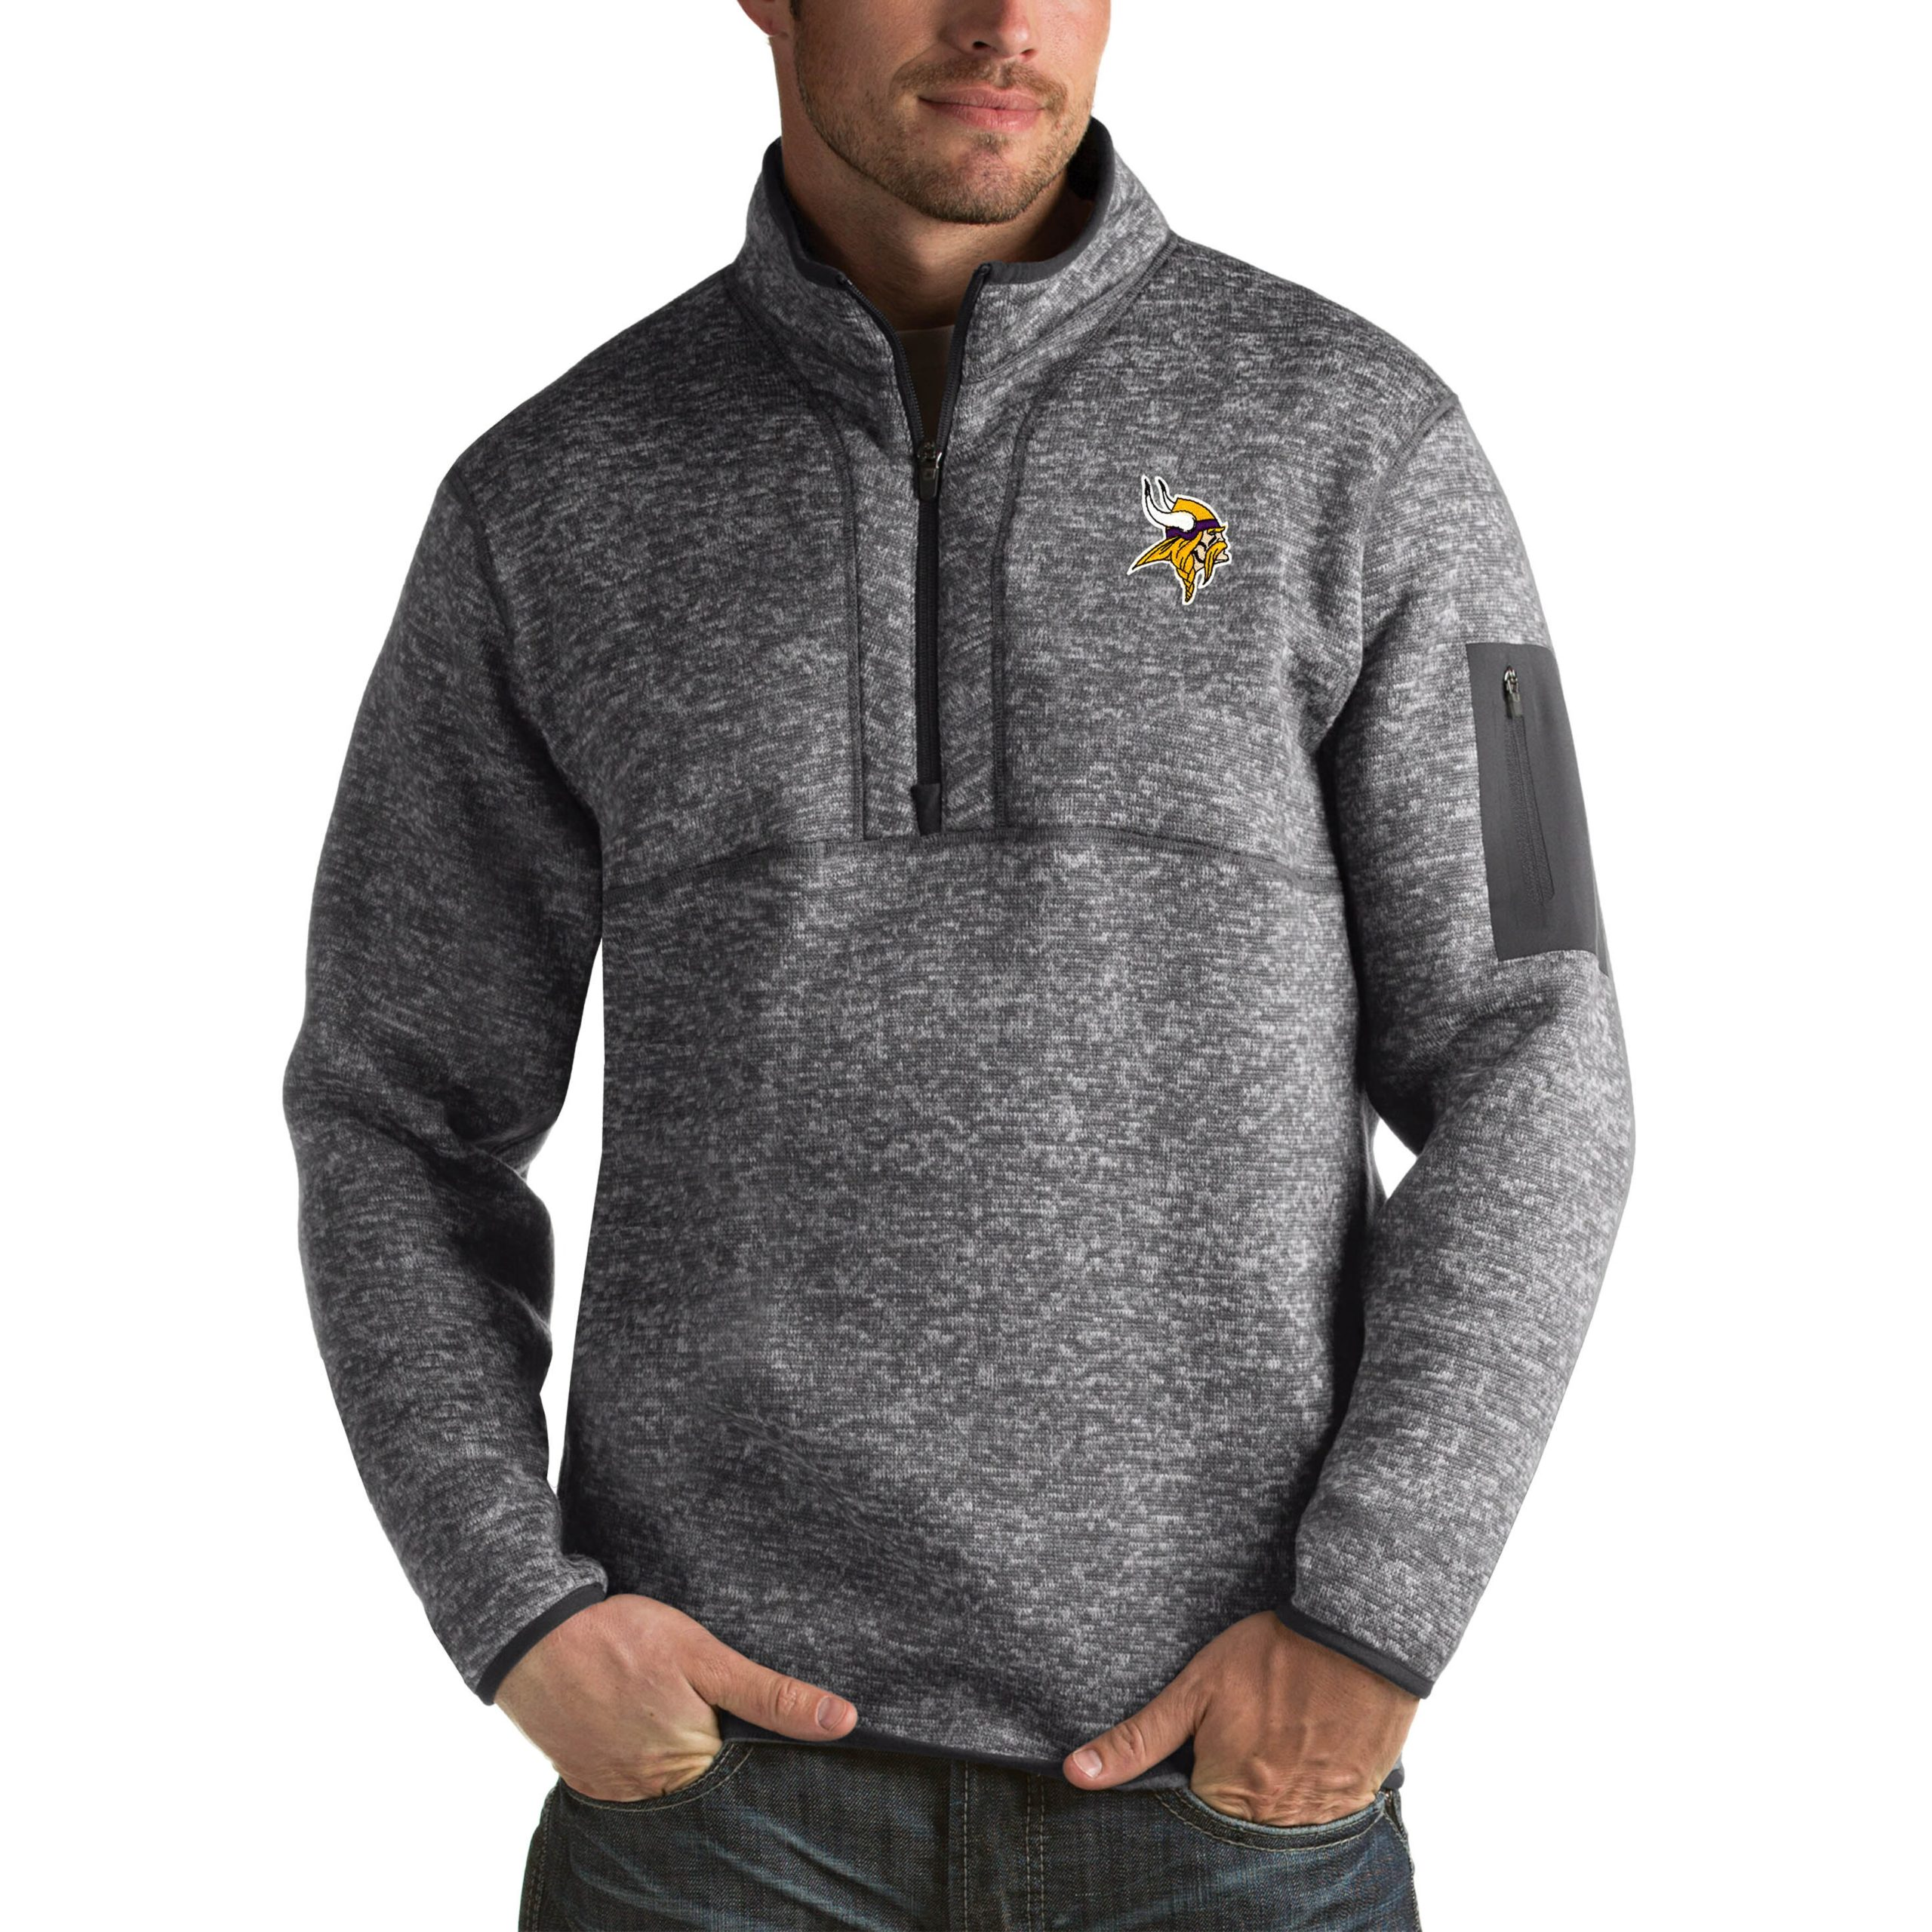 Minnesota Vikings Antigua Fortune Big & Tall Quarter-Zip Pullover Jacket - Charcoal